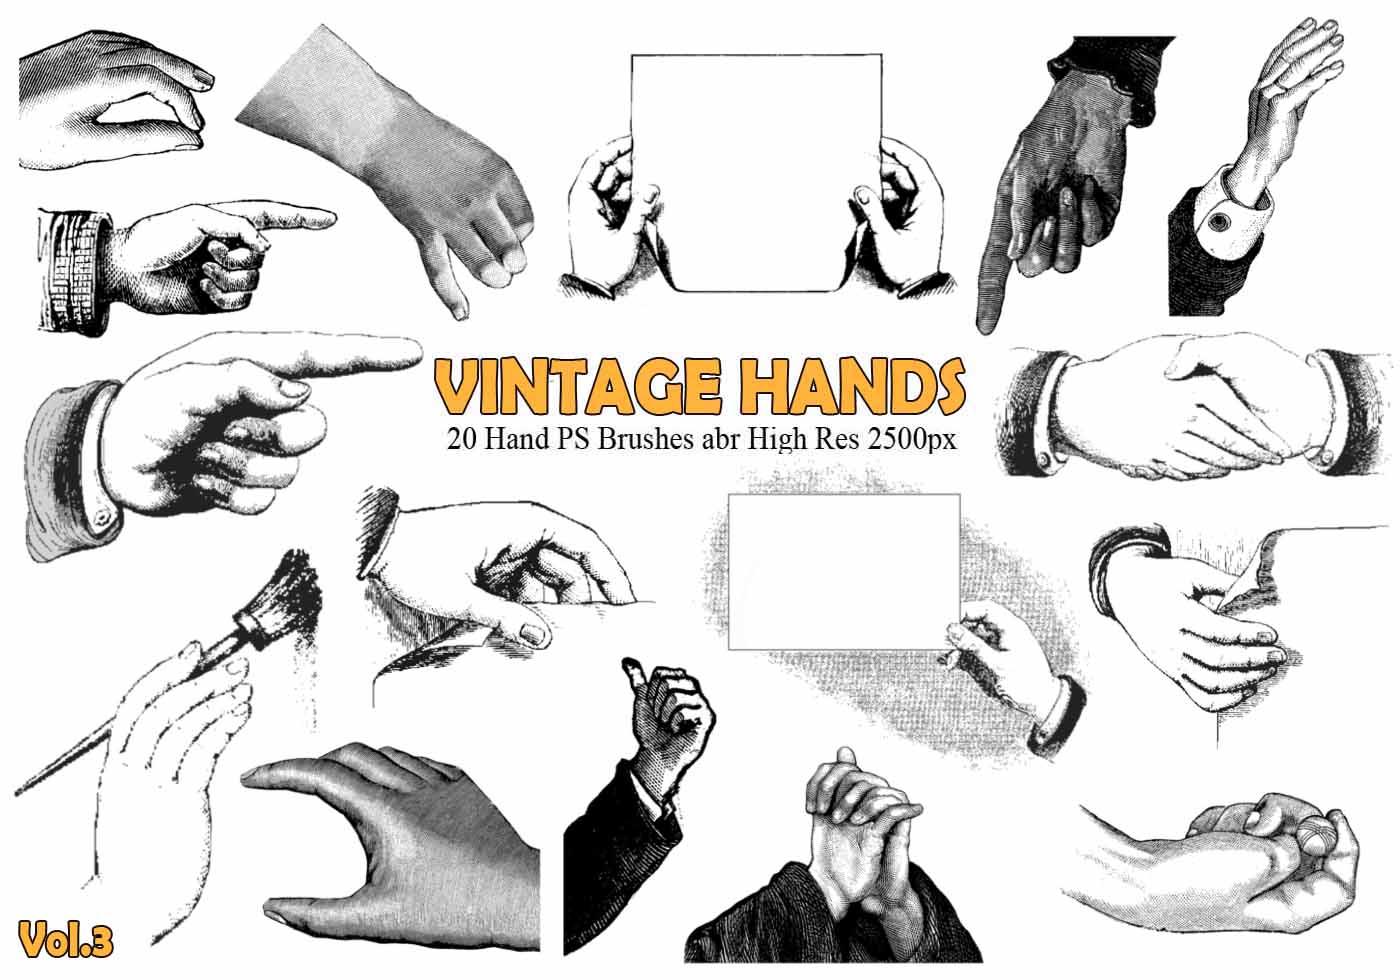 Vintage Hand 97